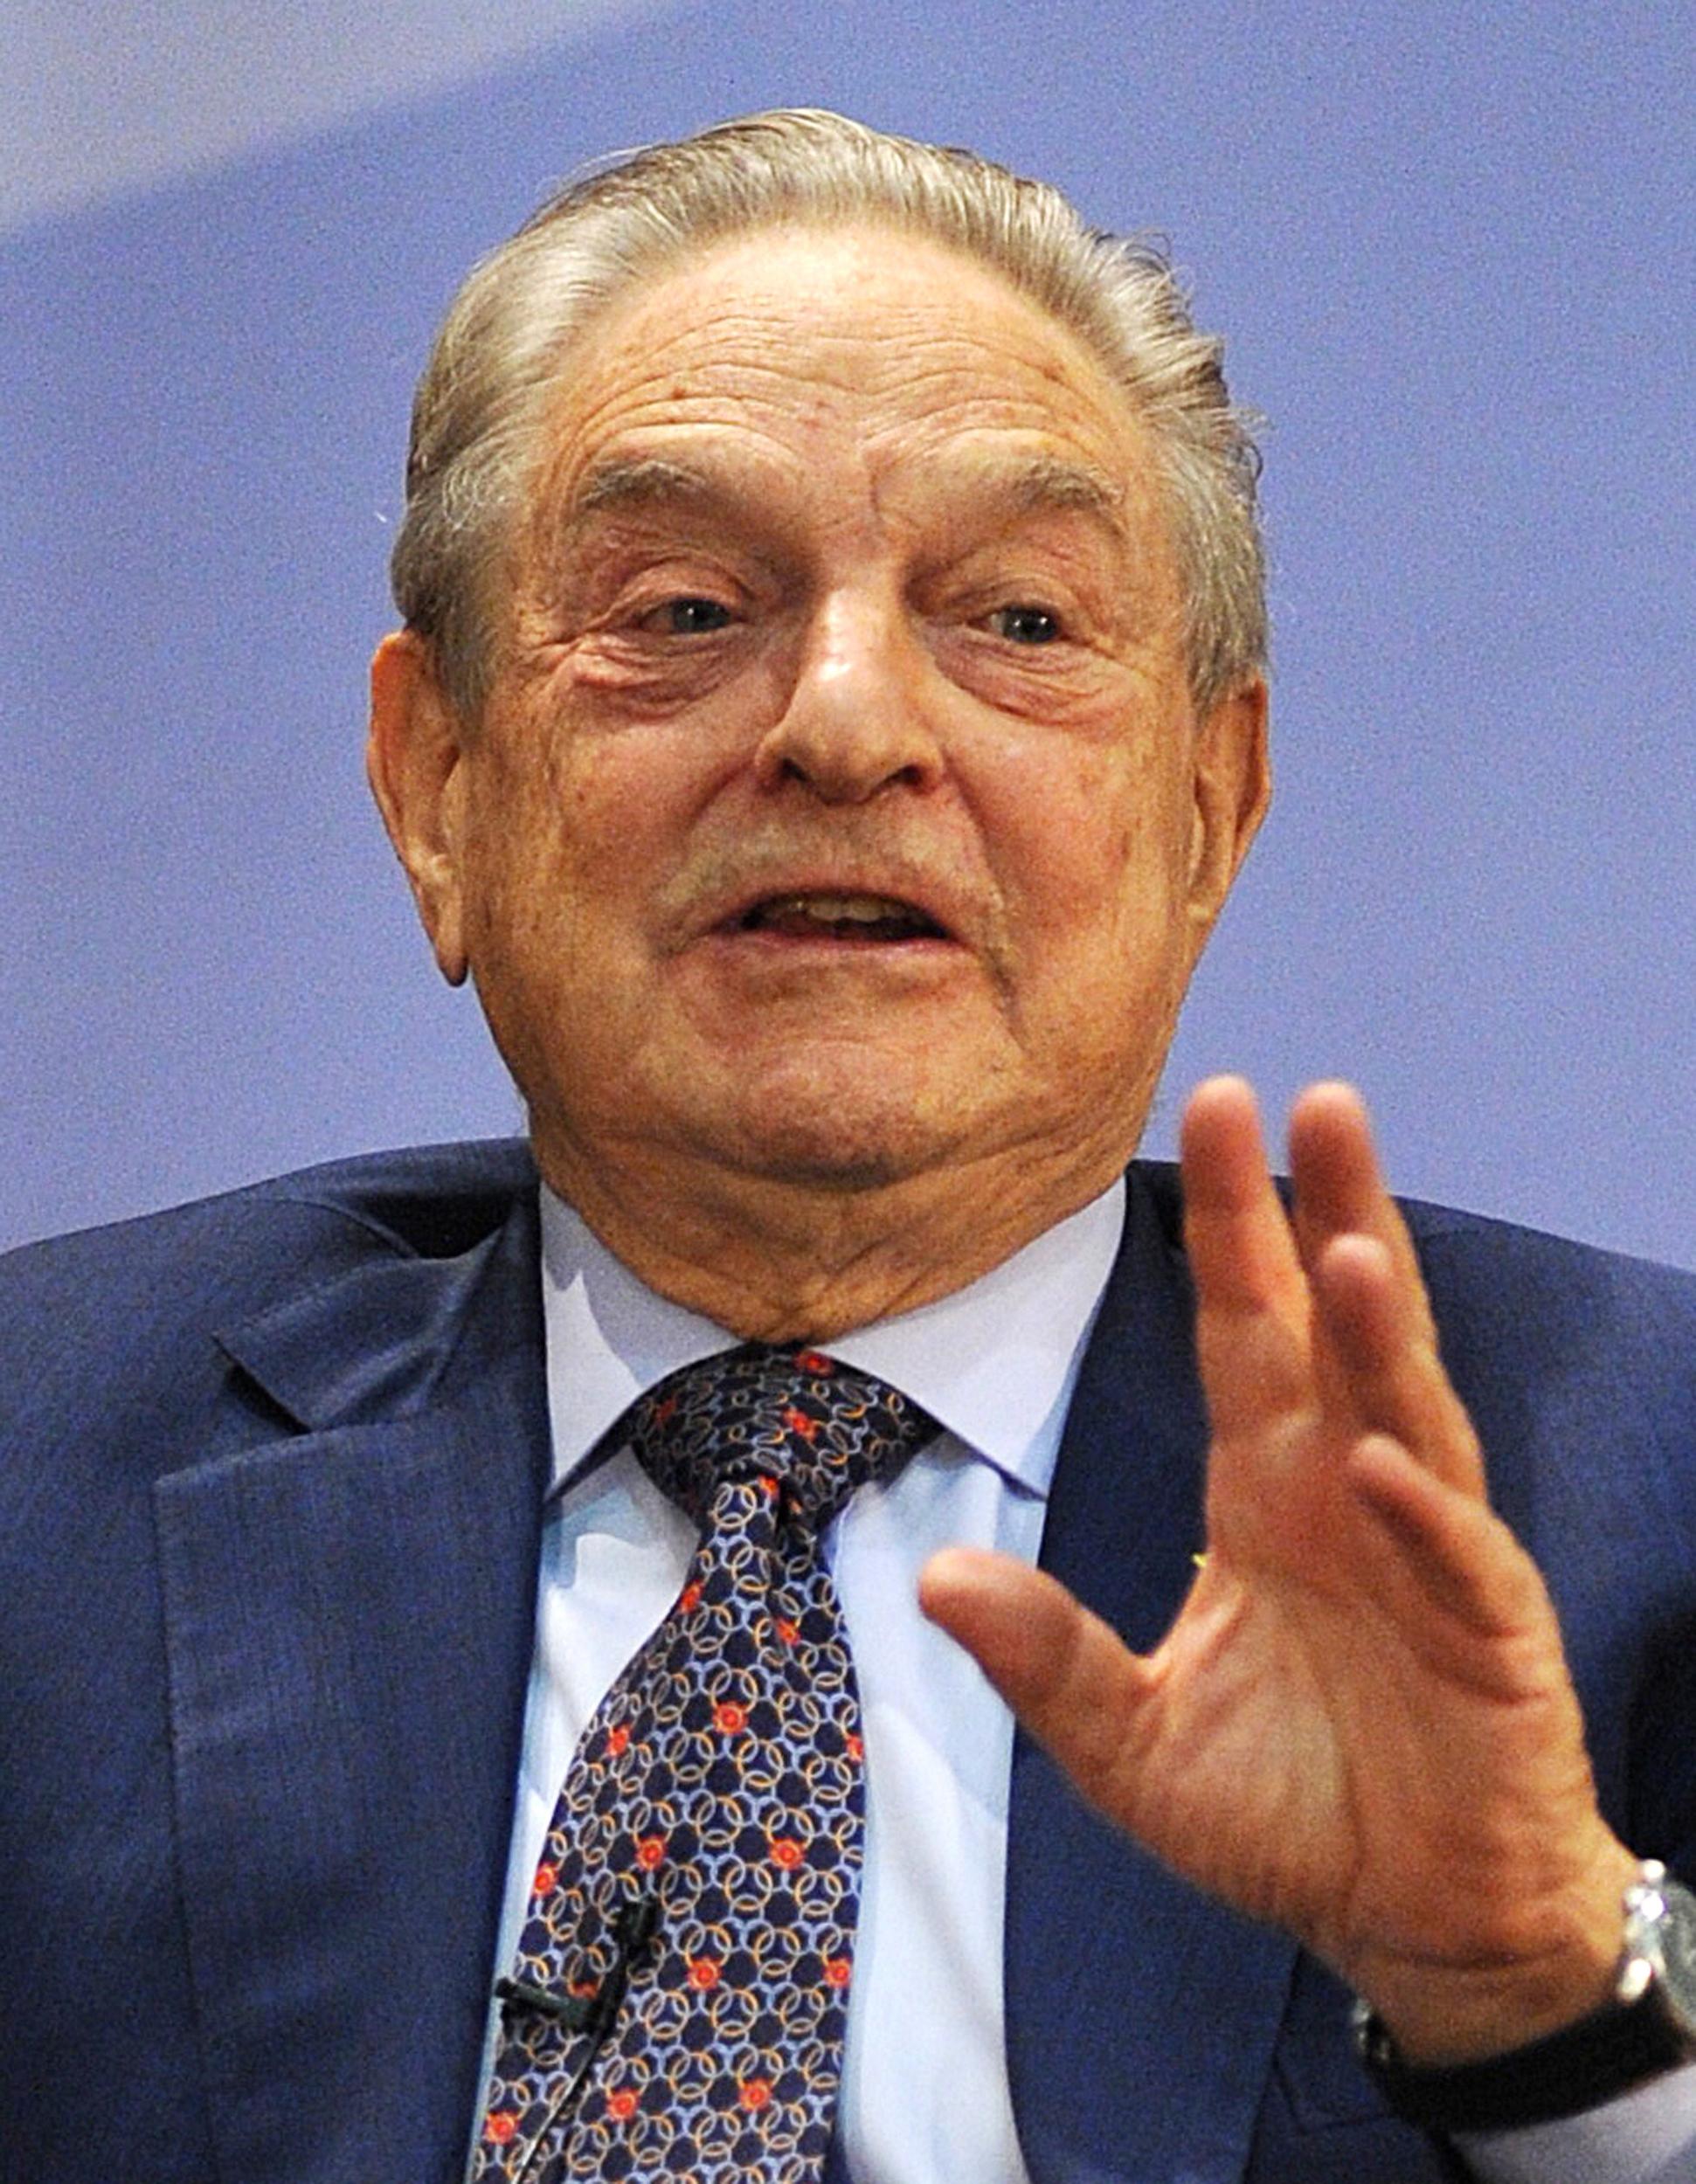 George Soros nu a repetat performanţa din 1992, când a pariat ...